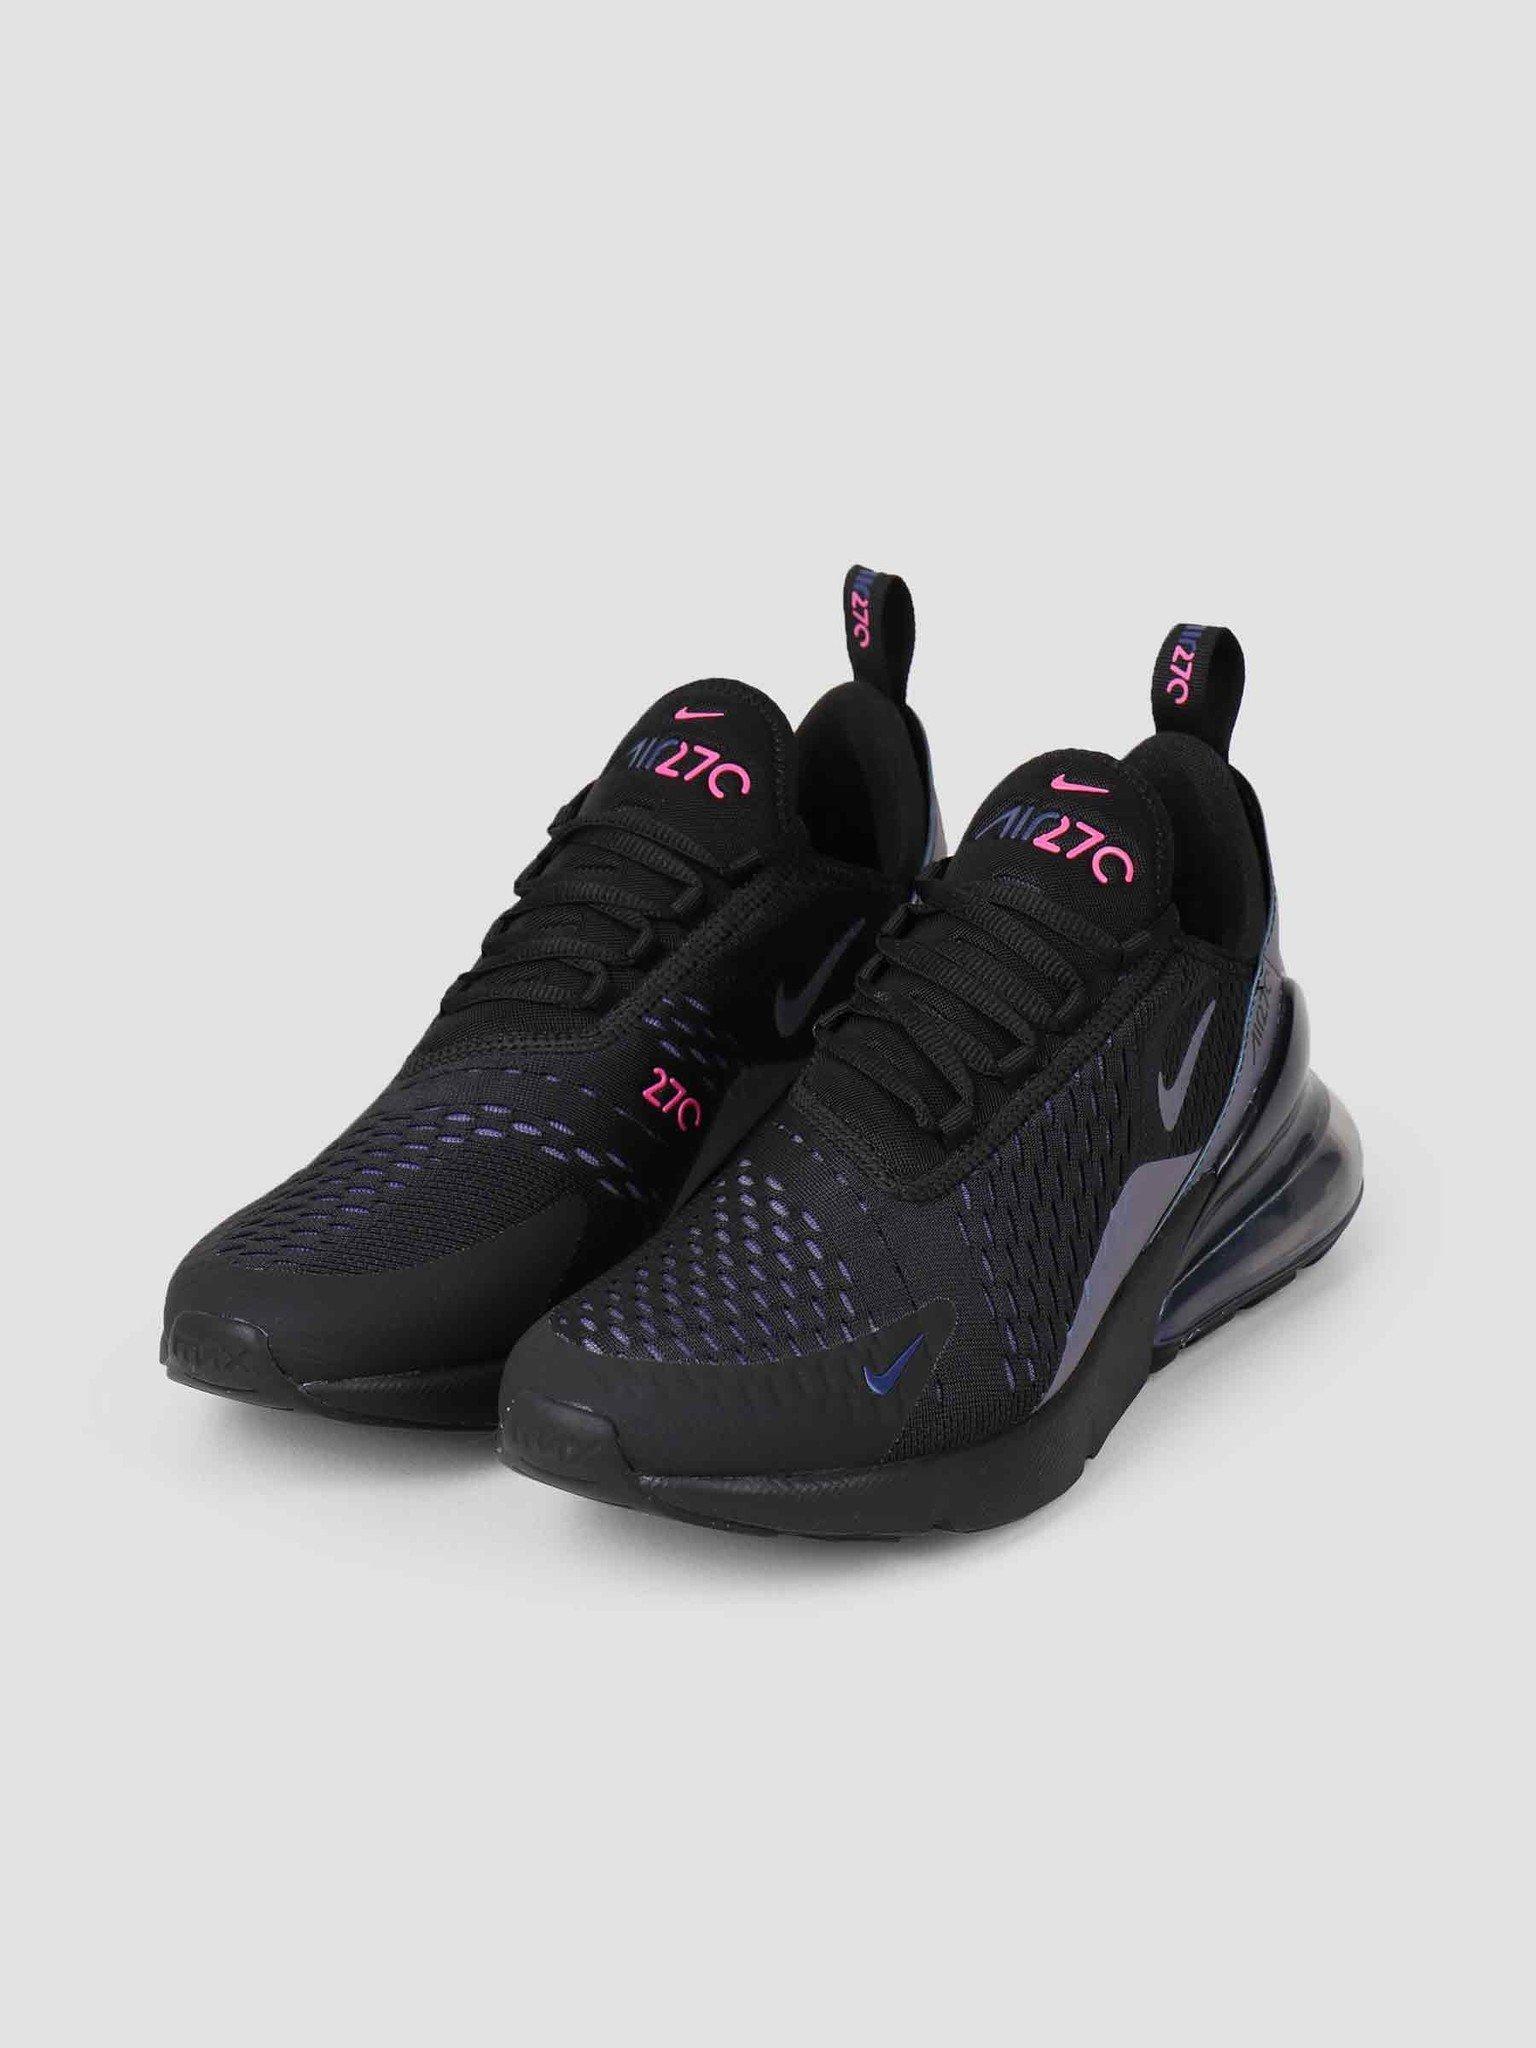 best authentic ac921 1f7a8 Nike Nike Air Max 270 Black Laser AH8050-020